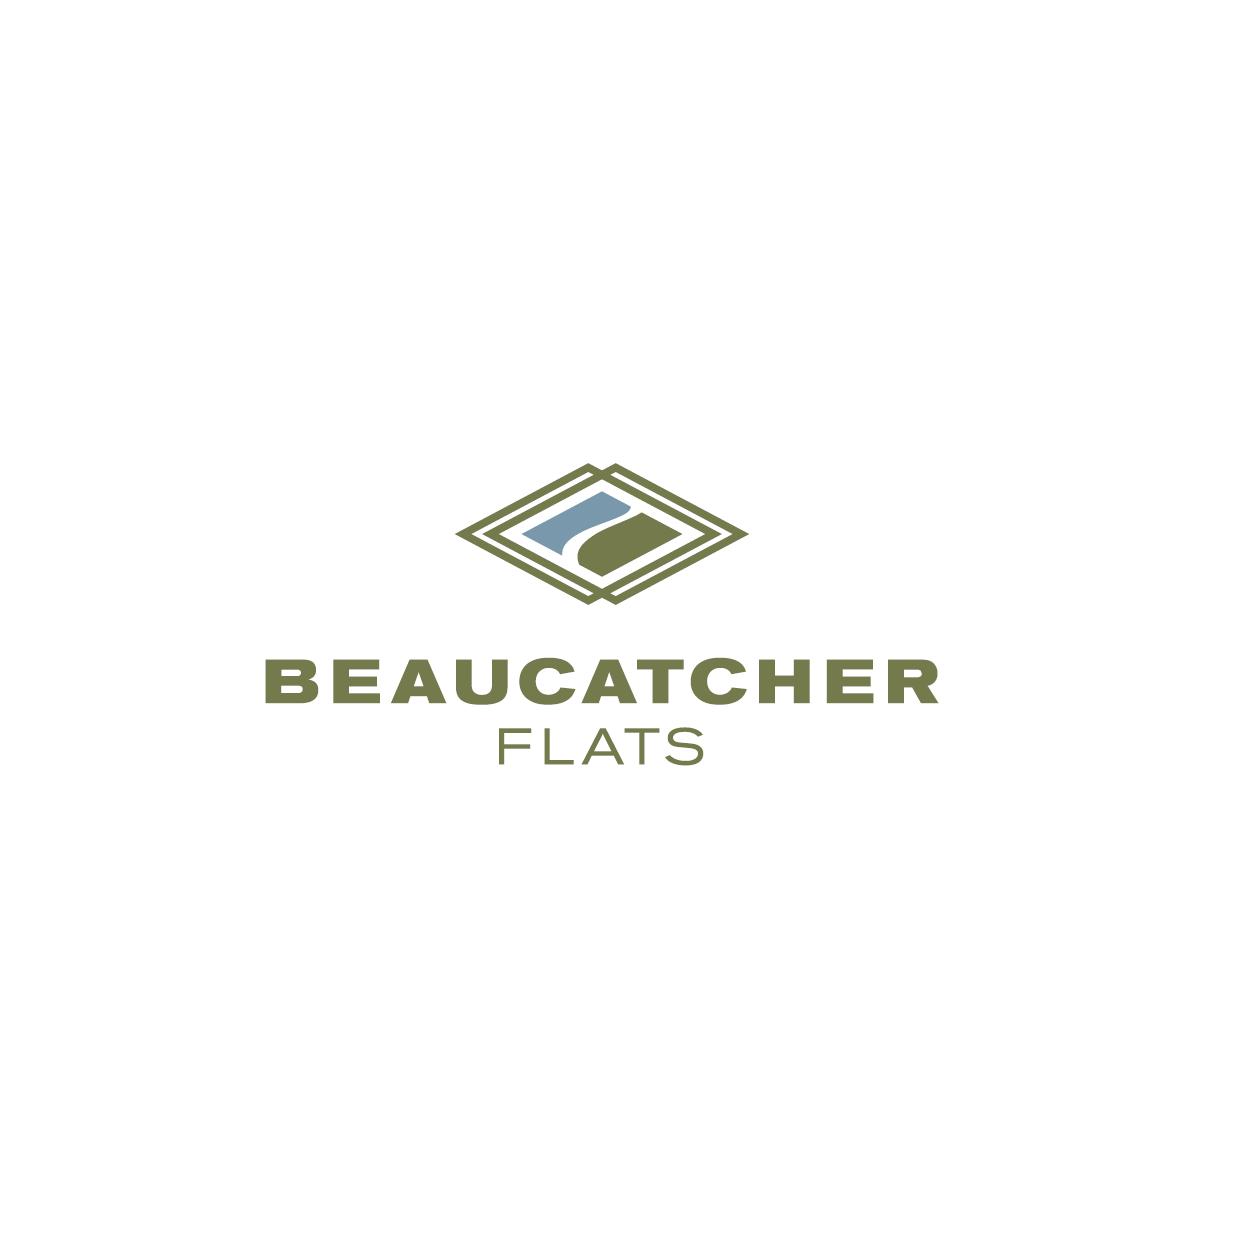 Beaucatcher Flats image 5